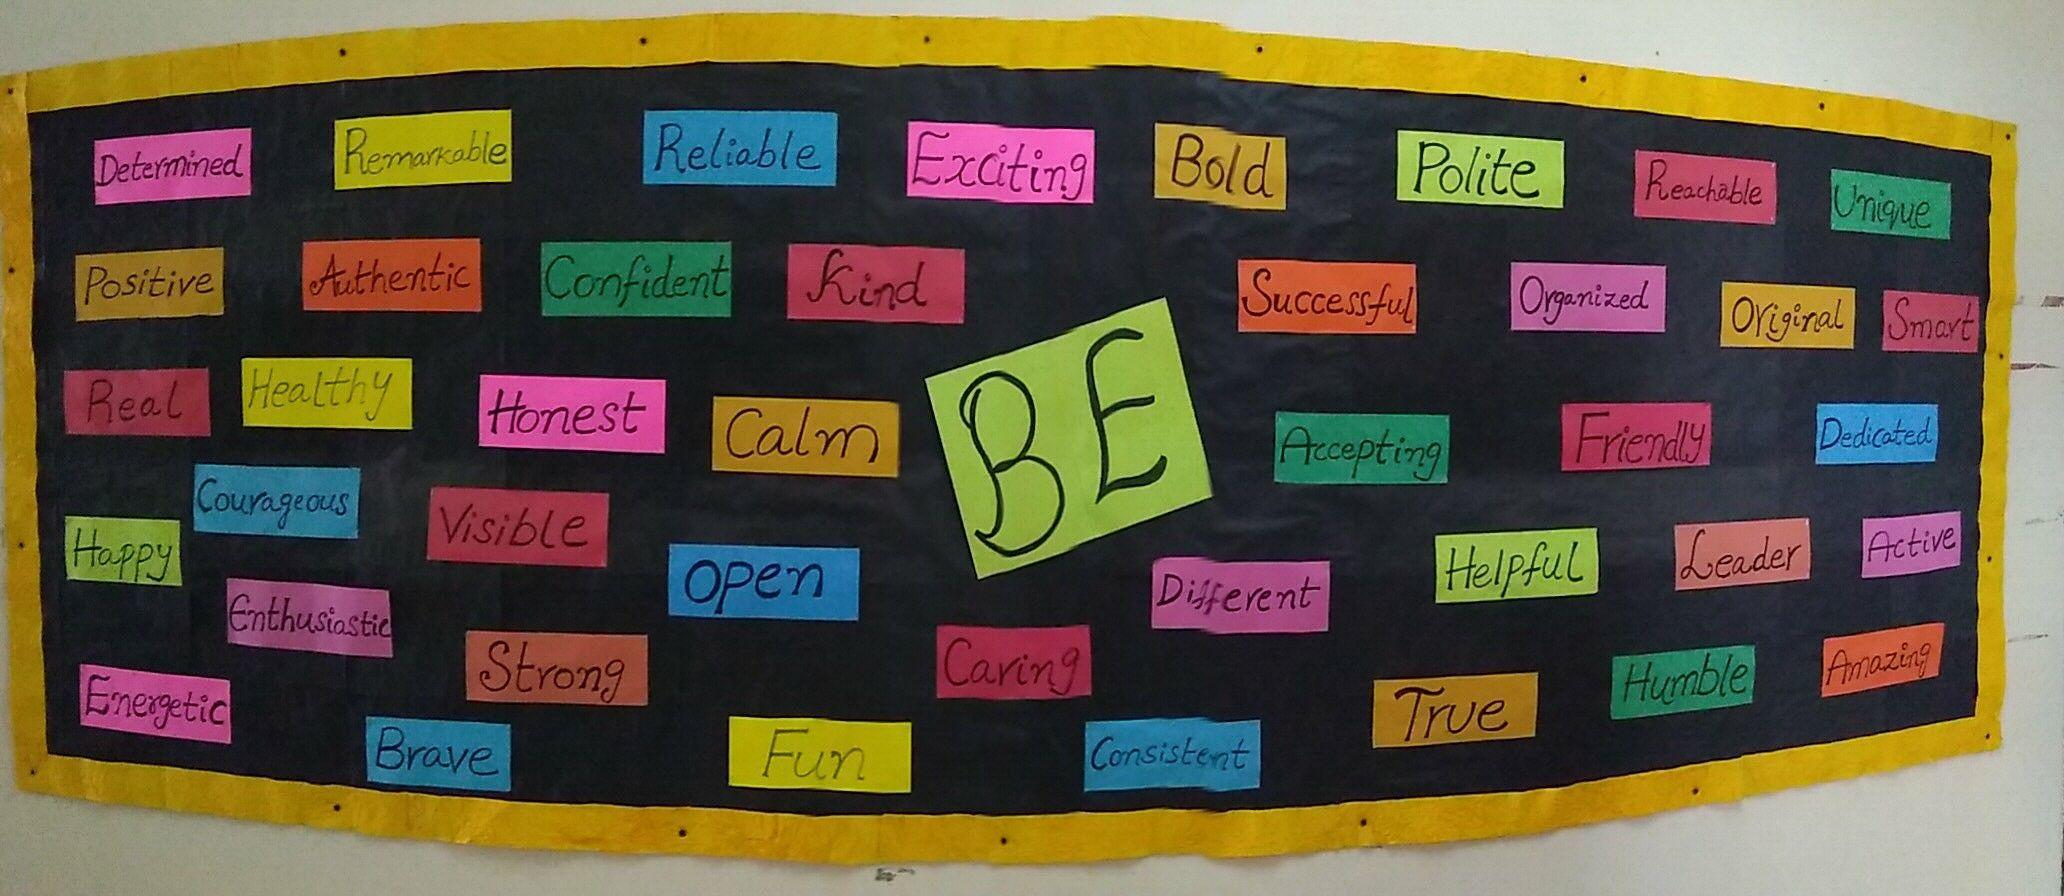 40 positive words Positive words, Positivity, Language